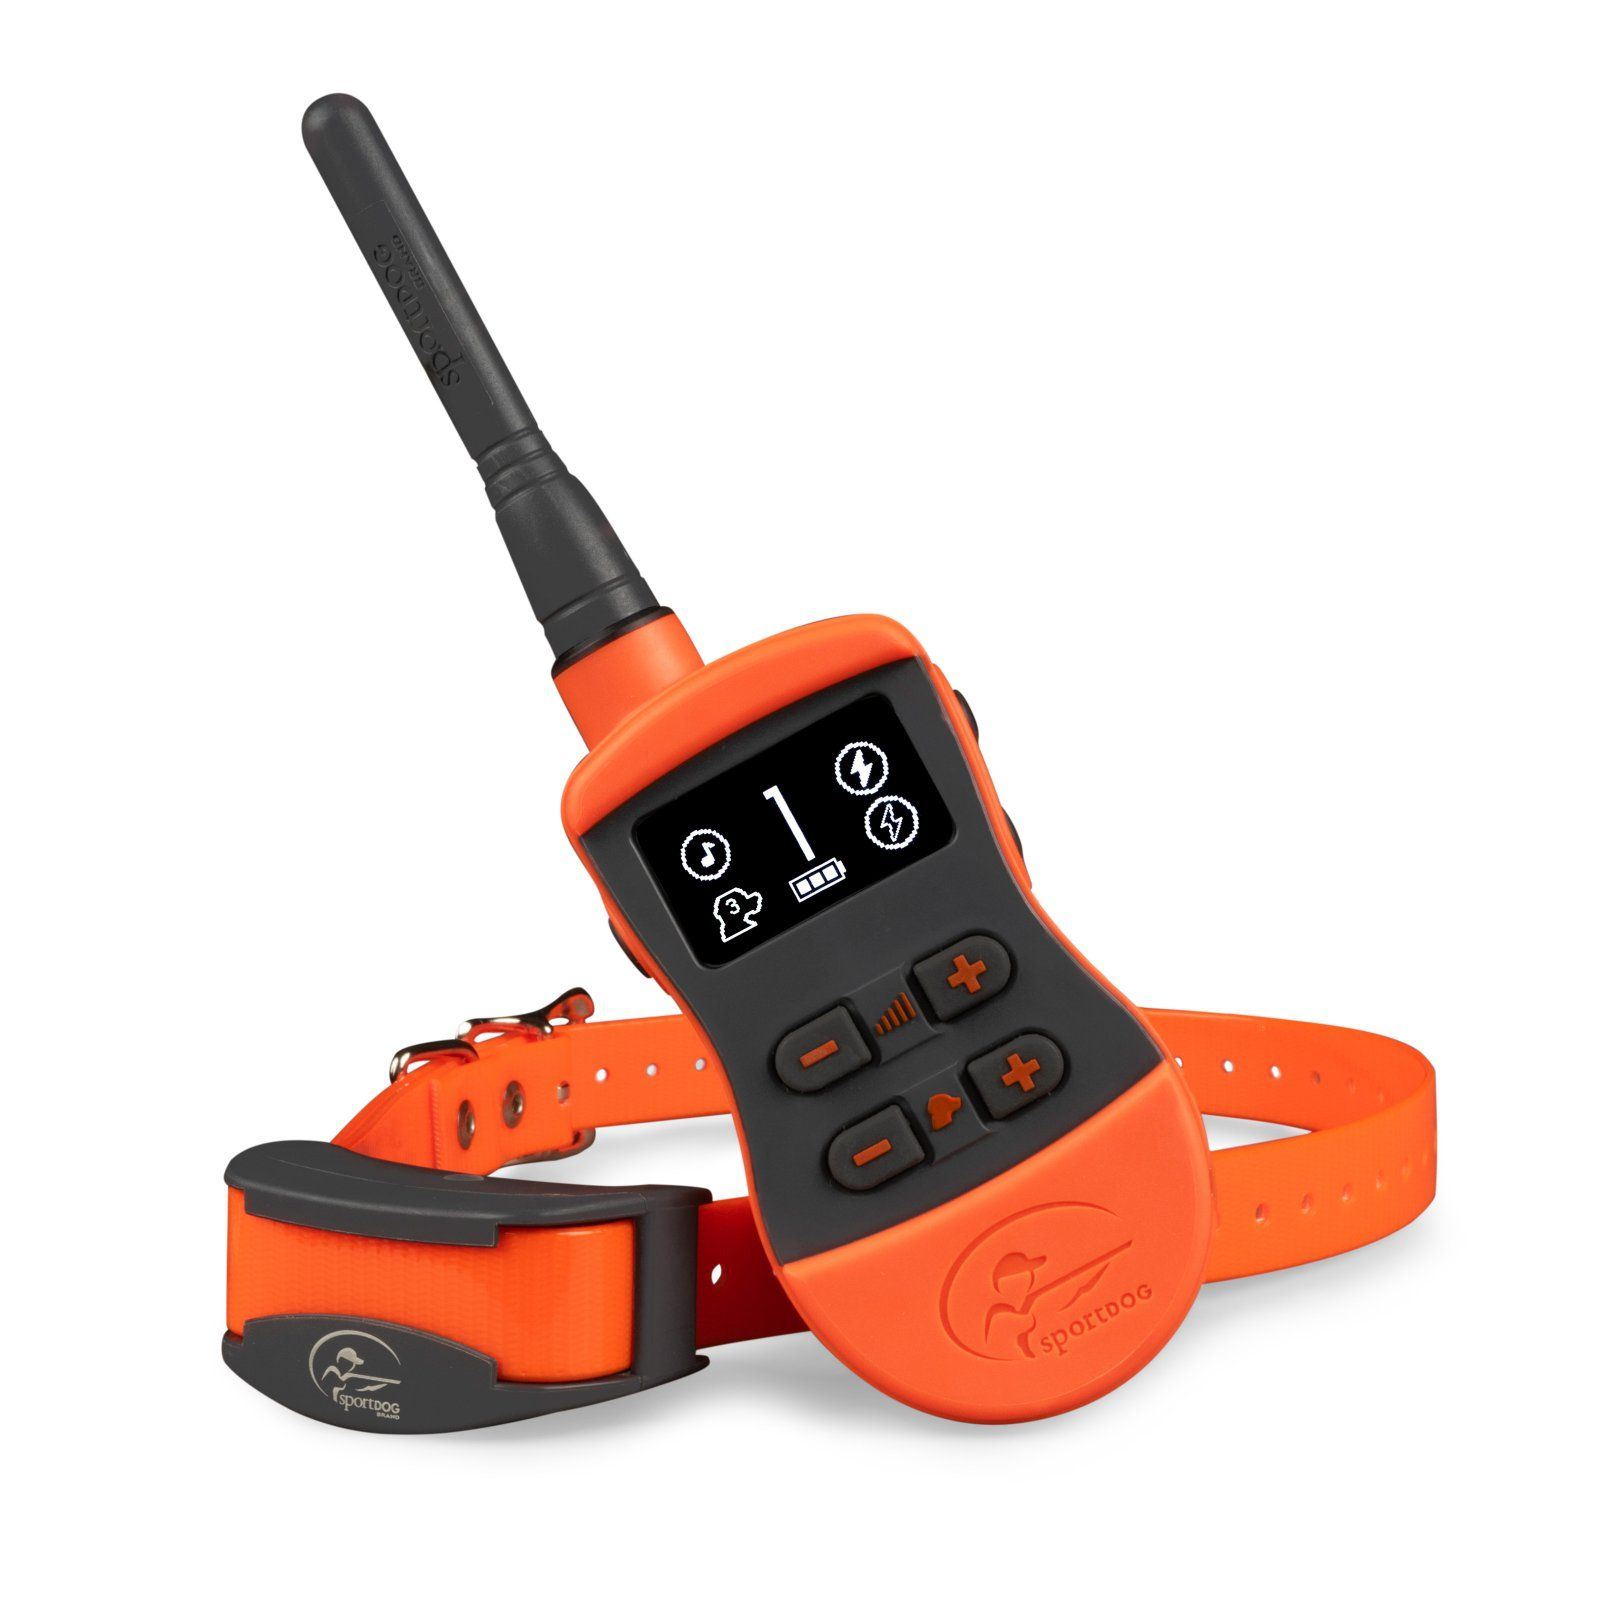 Sportdog Sporttrainer 875e With Images Dog Training Collar